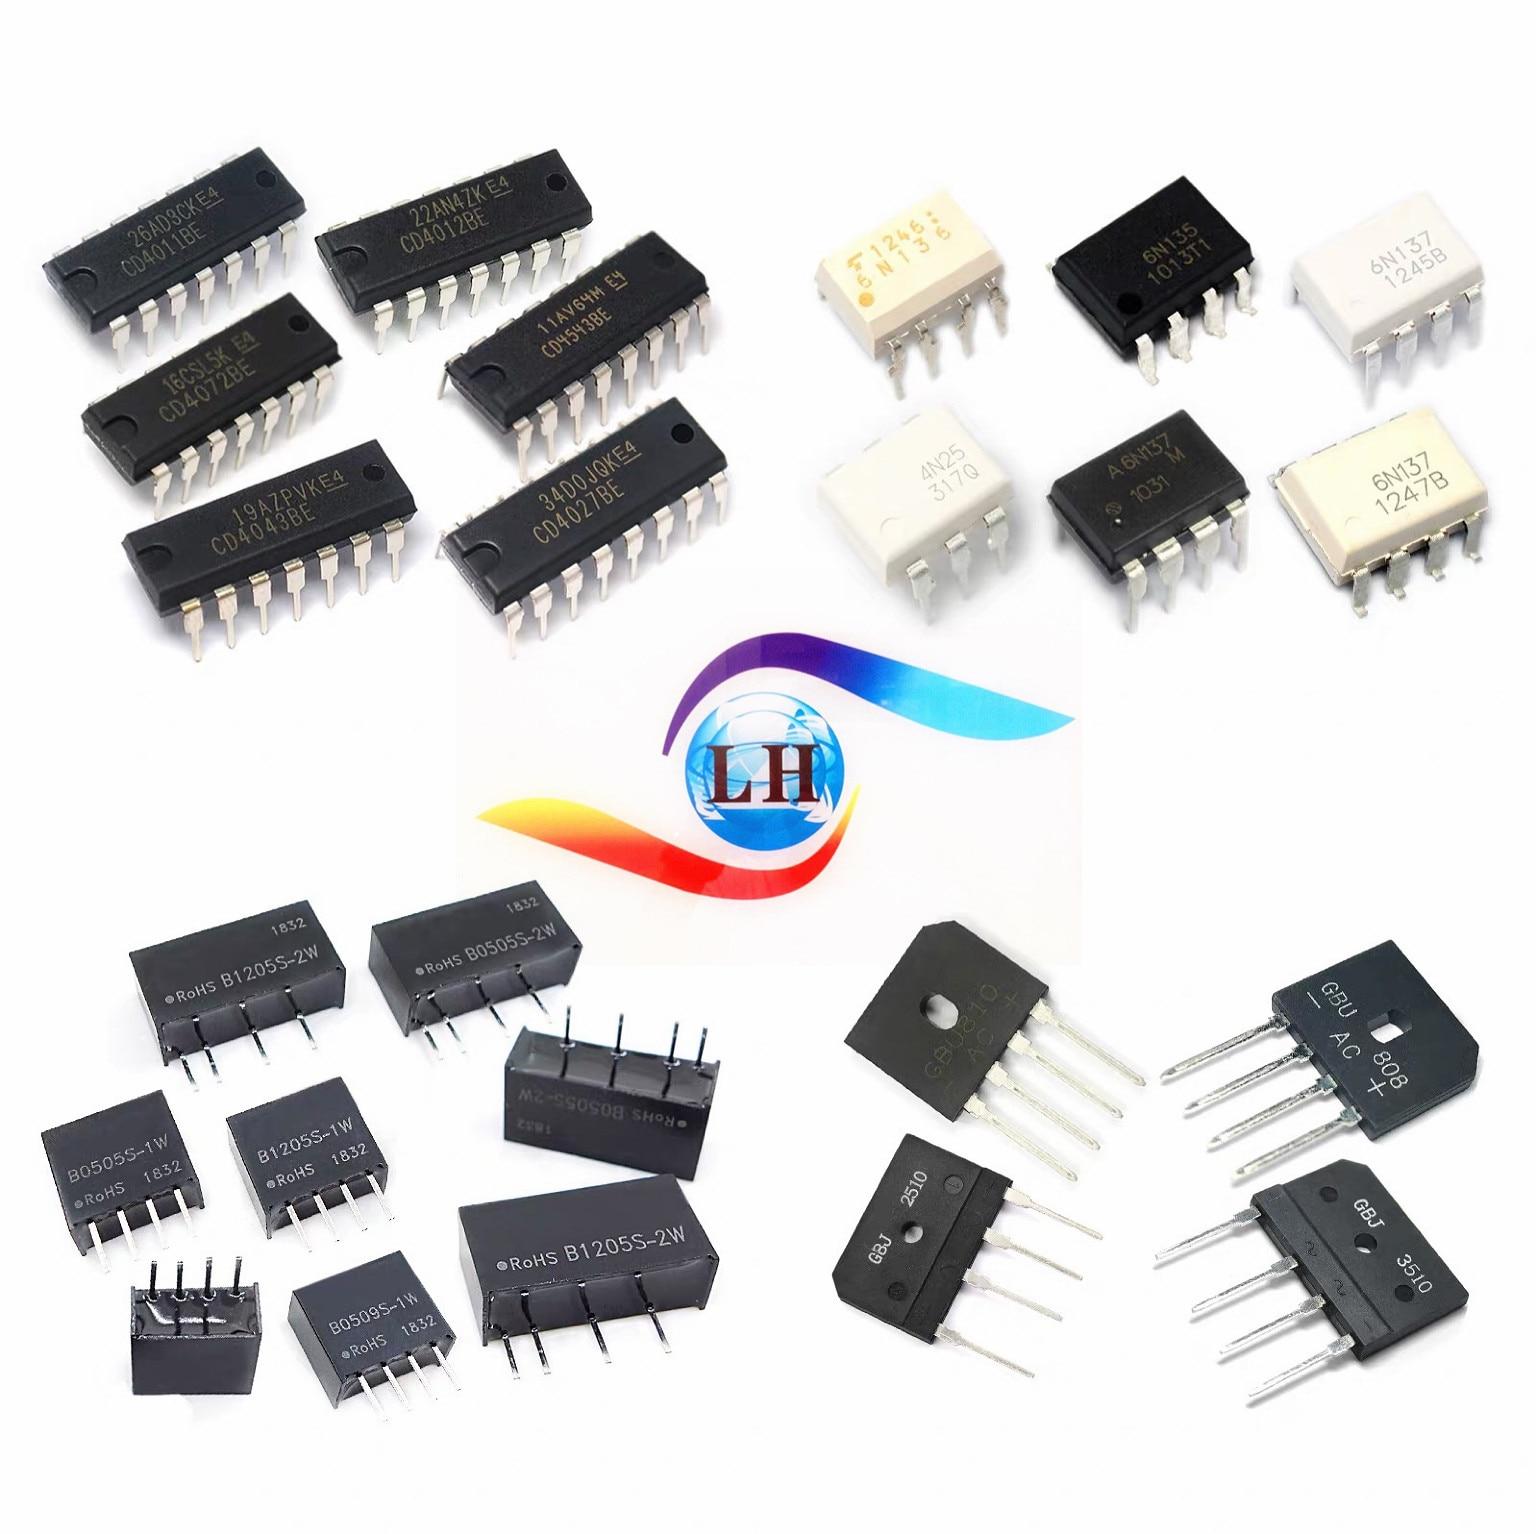 En Stock Original SN75189AN SN75189 DIP14 driver de línea de cuatro vías nuevo chip